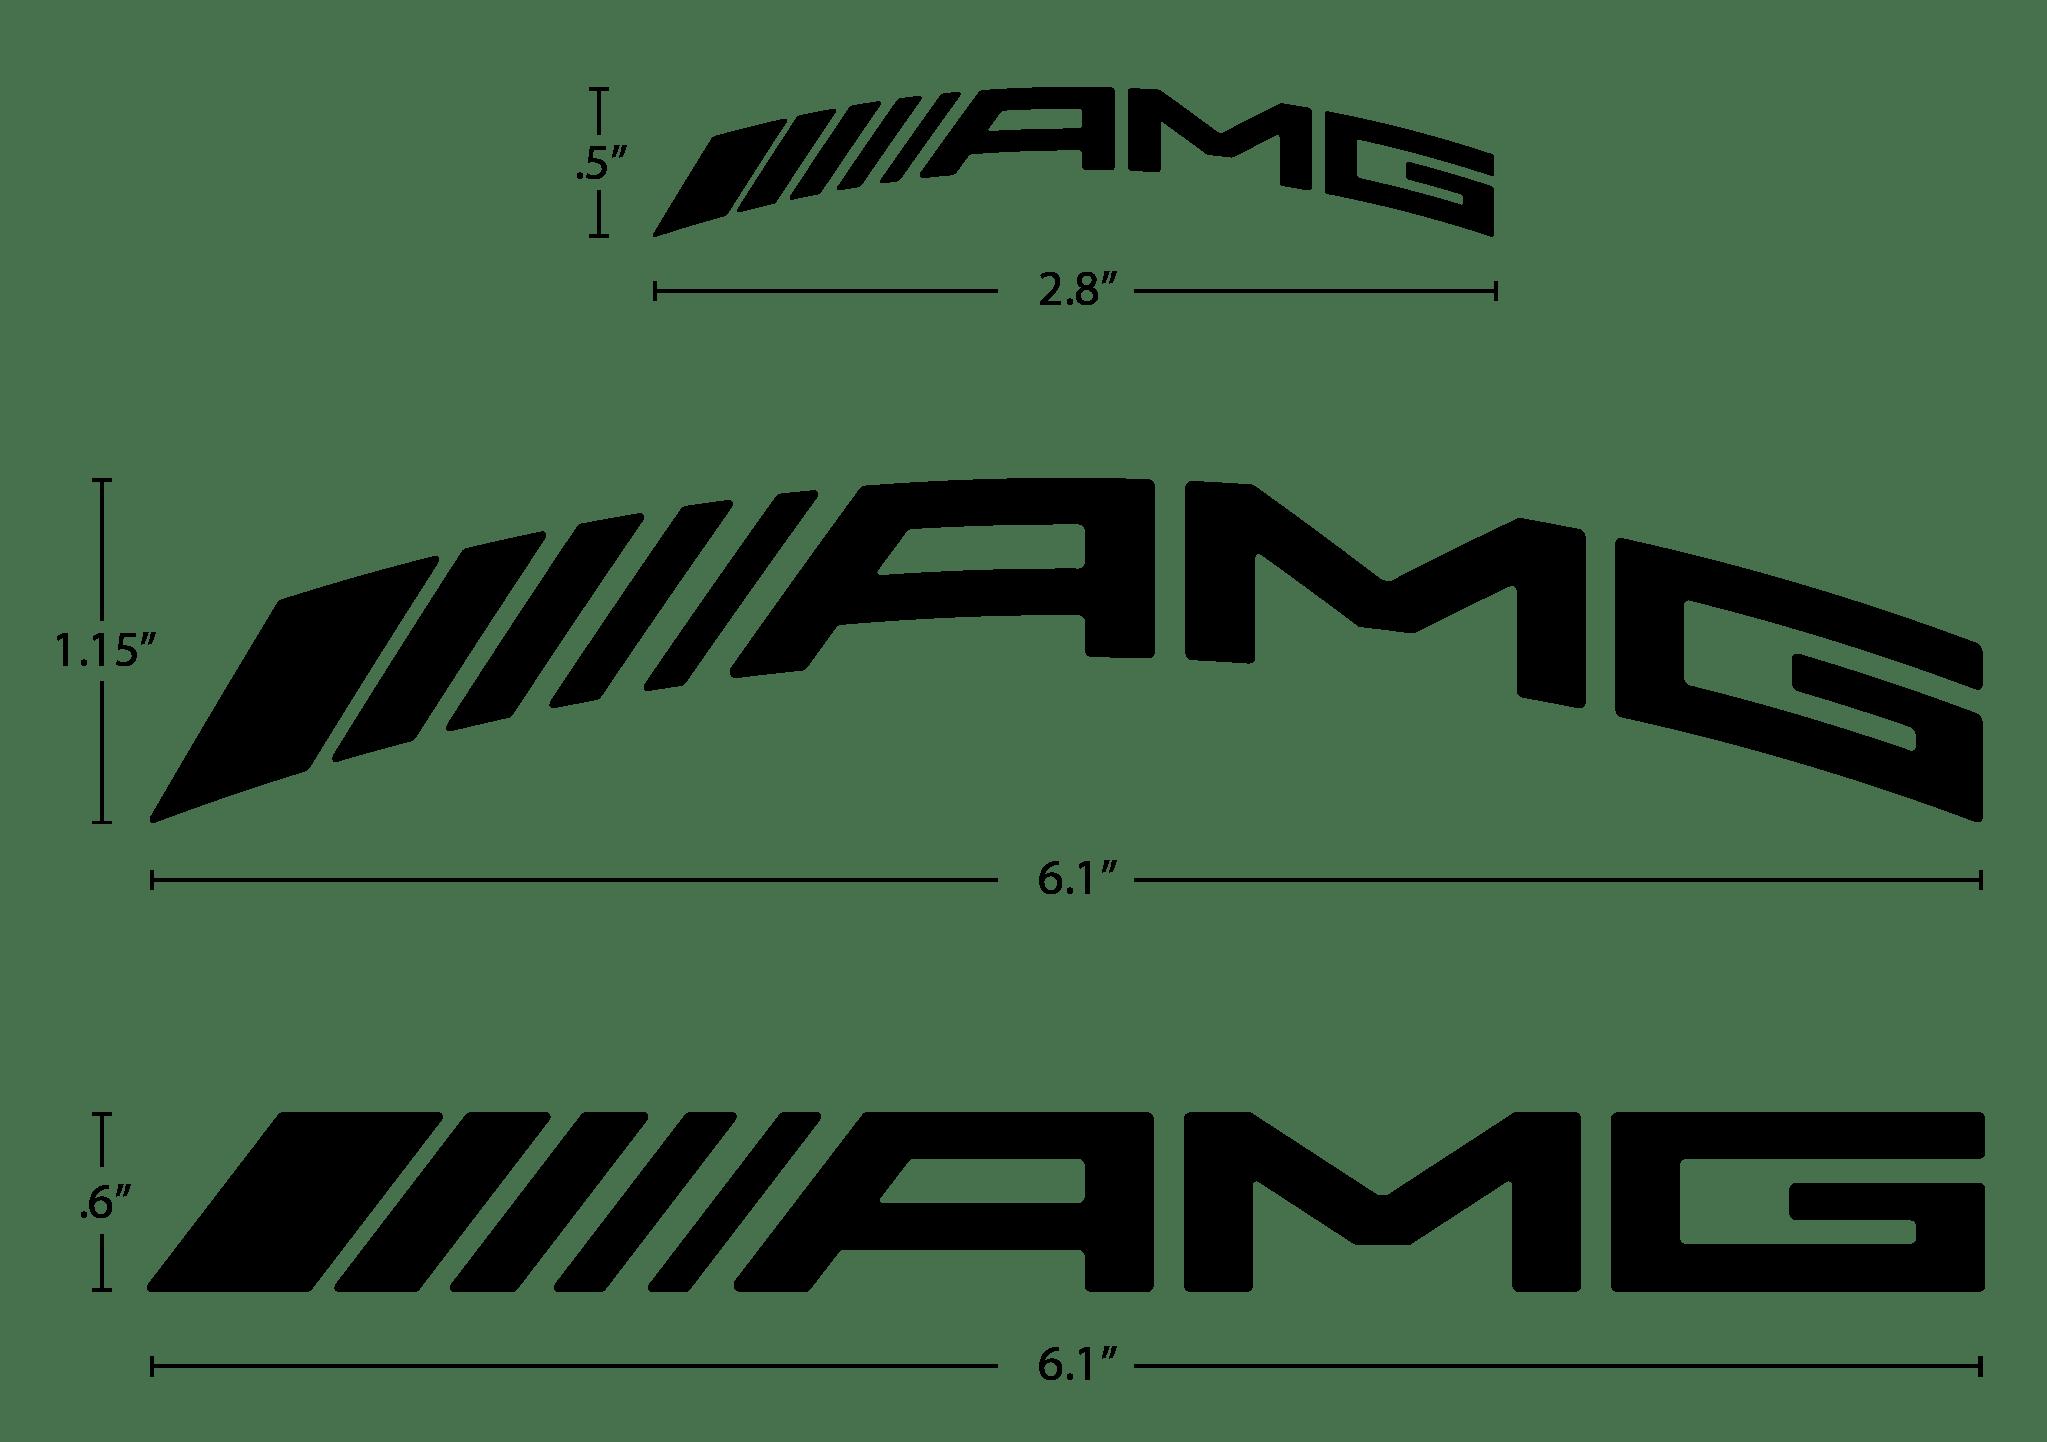 Revised Amg Curved Brake Caliper Decal Feedback Please